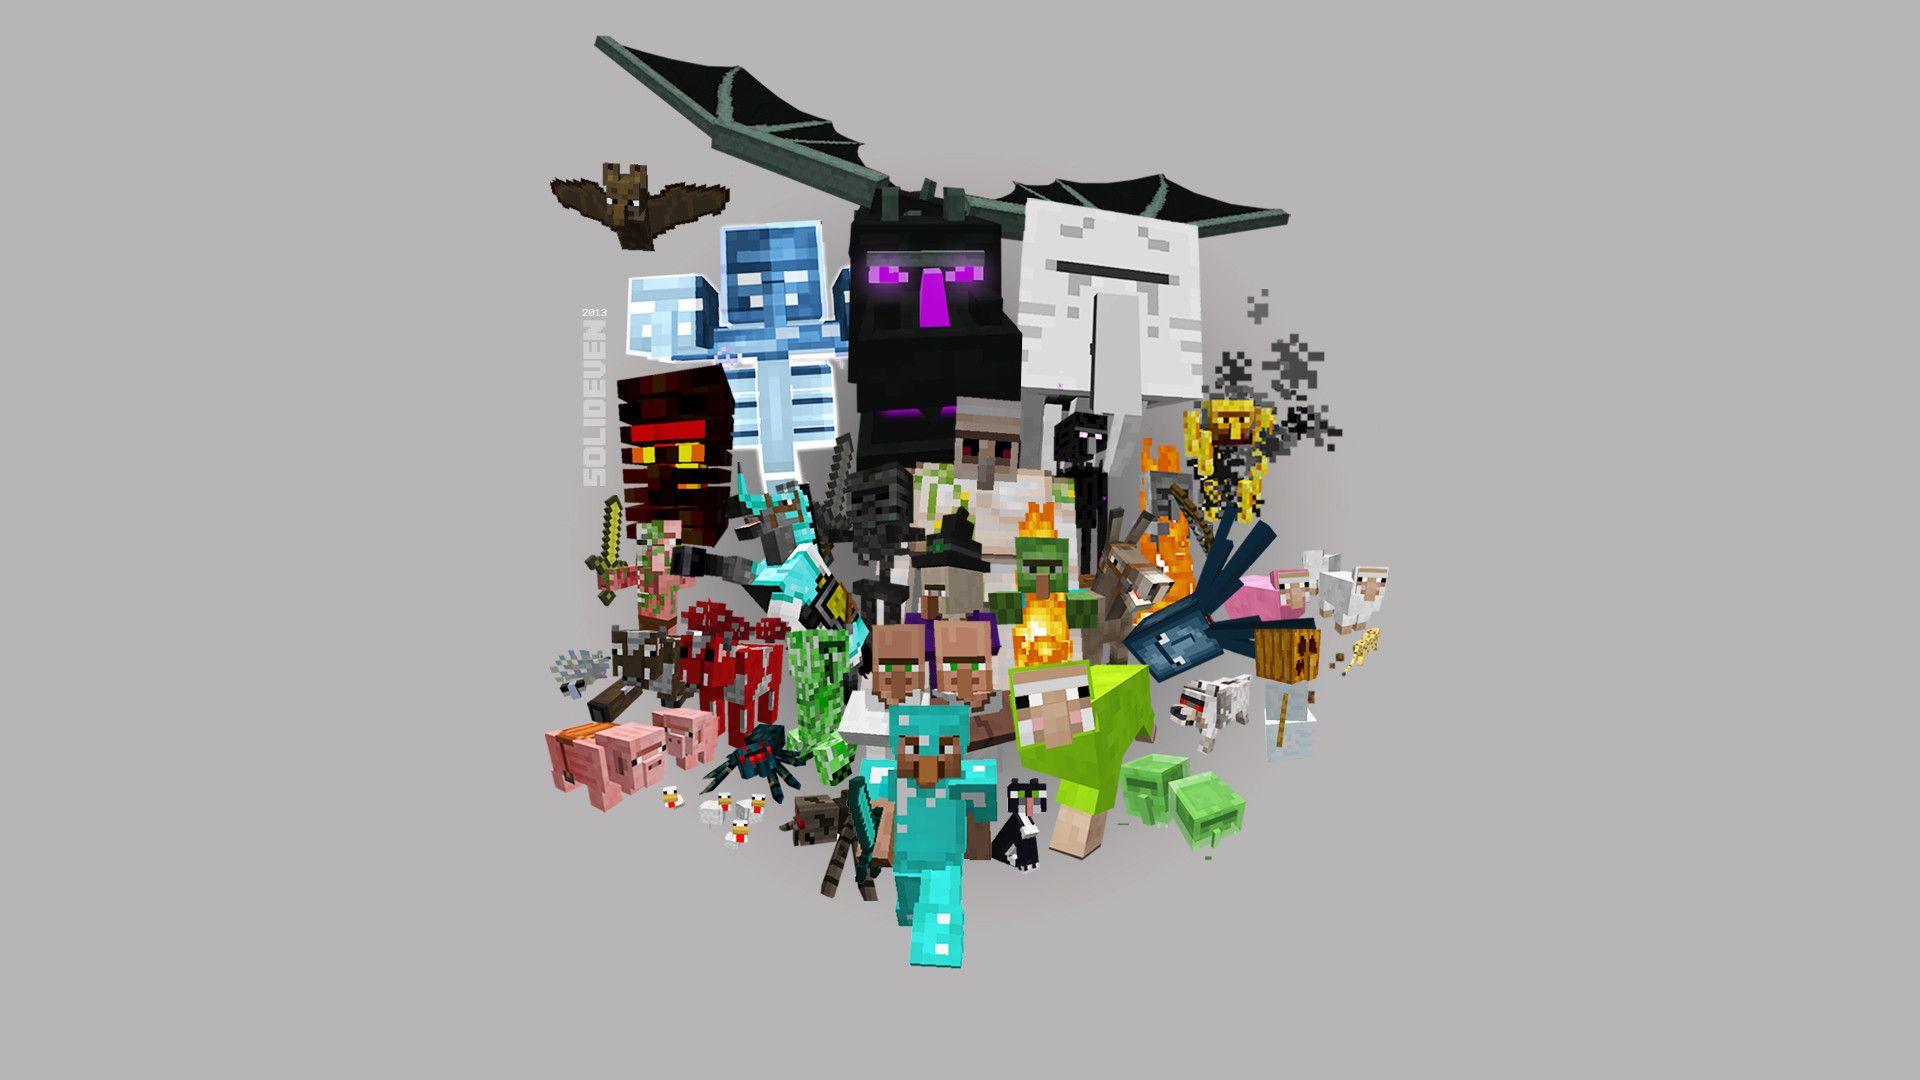 Good Wallpaper Minecraft Chromebook - 9c529330acc4febc2dc8e7f9393e4200  Photograph_227367.jpg